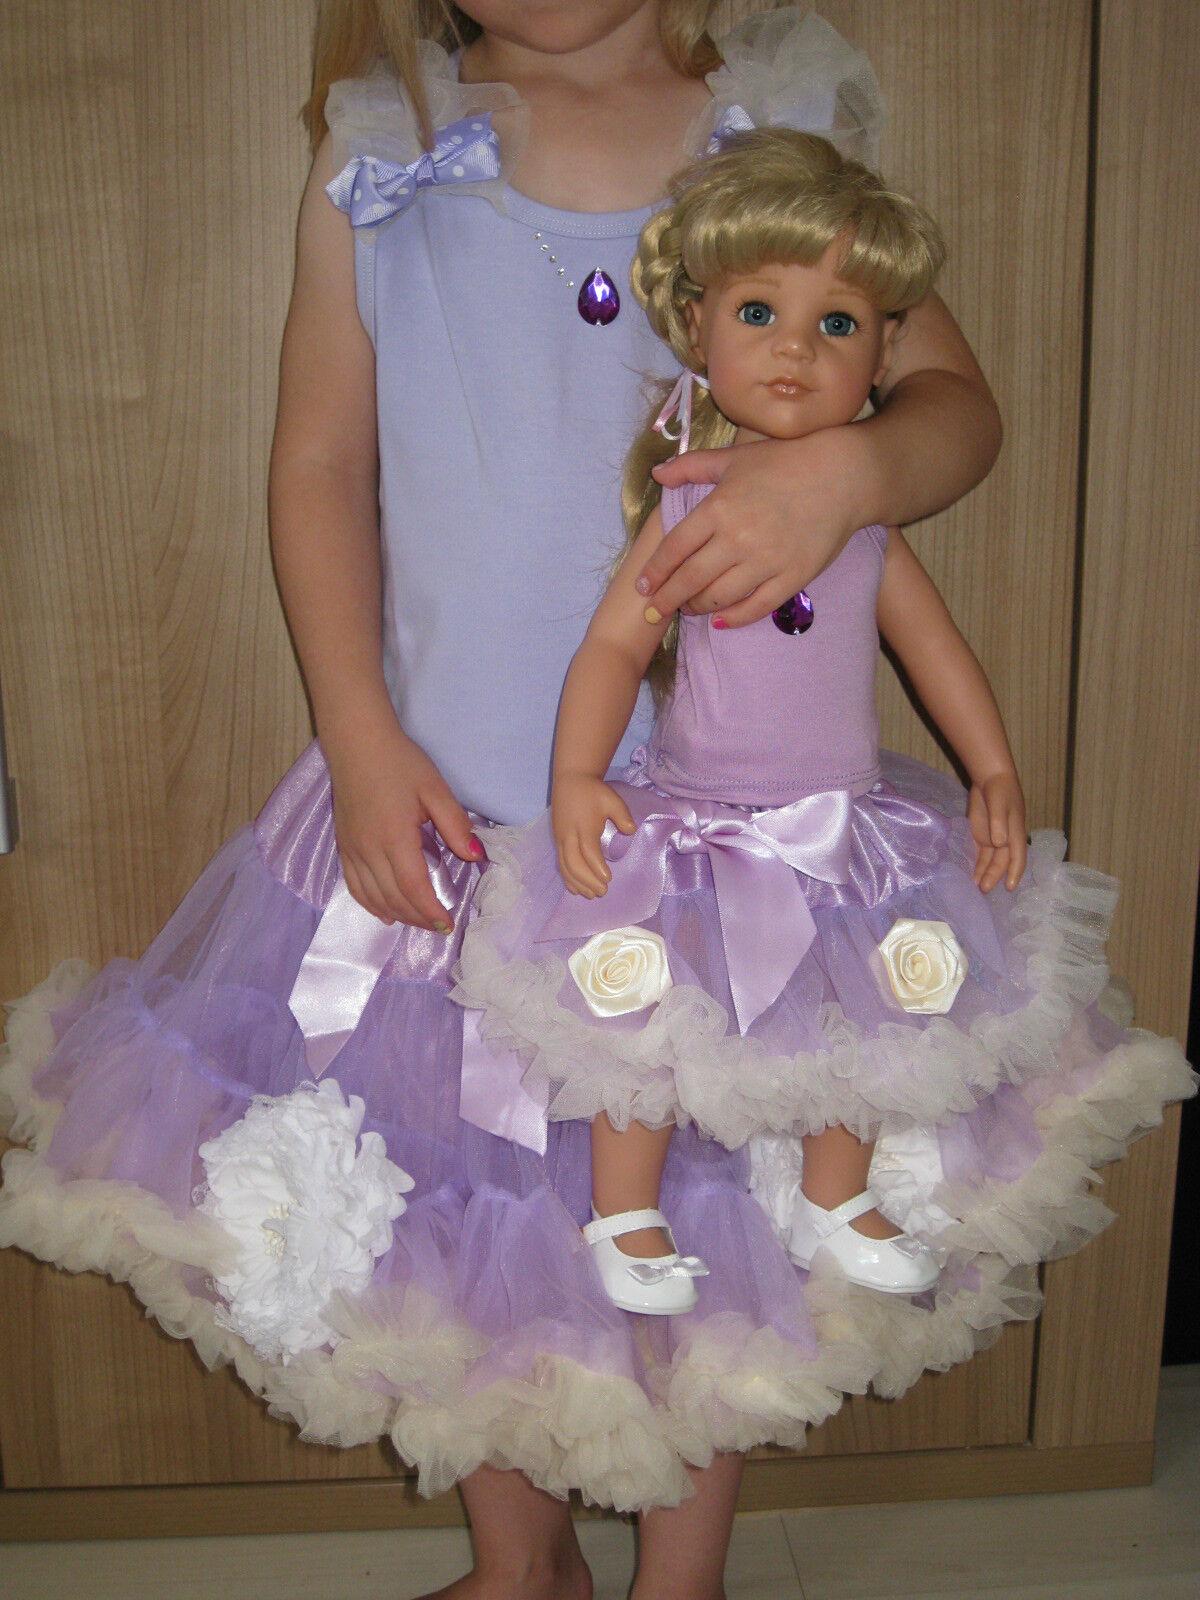 Bambole-Set + Ragazze-Set, 46-50cm BAMBOLA, gr 122, 5-7 J., vestiti bambole